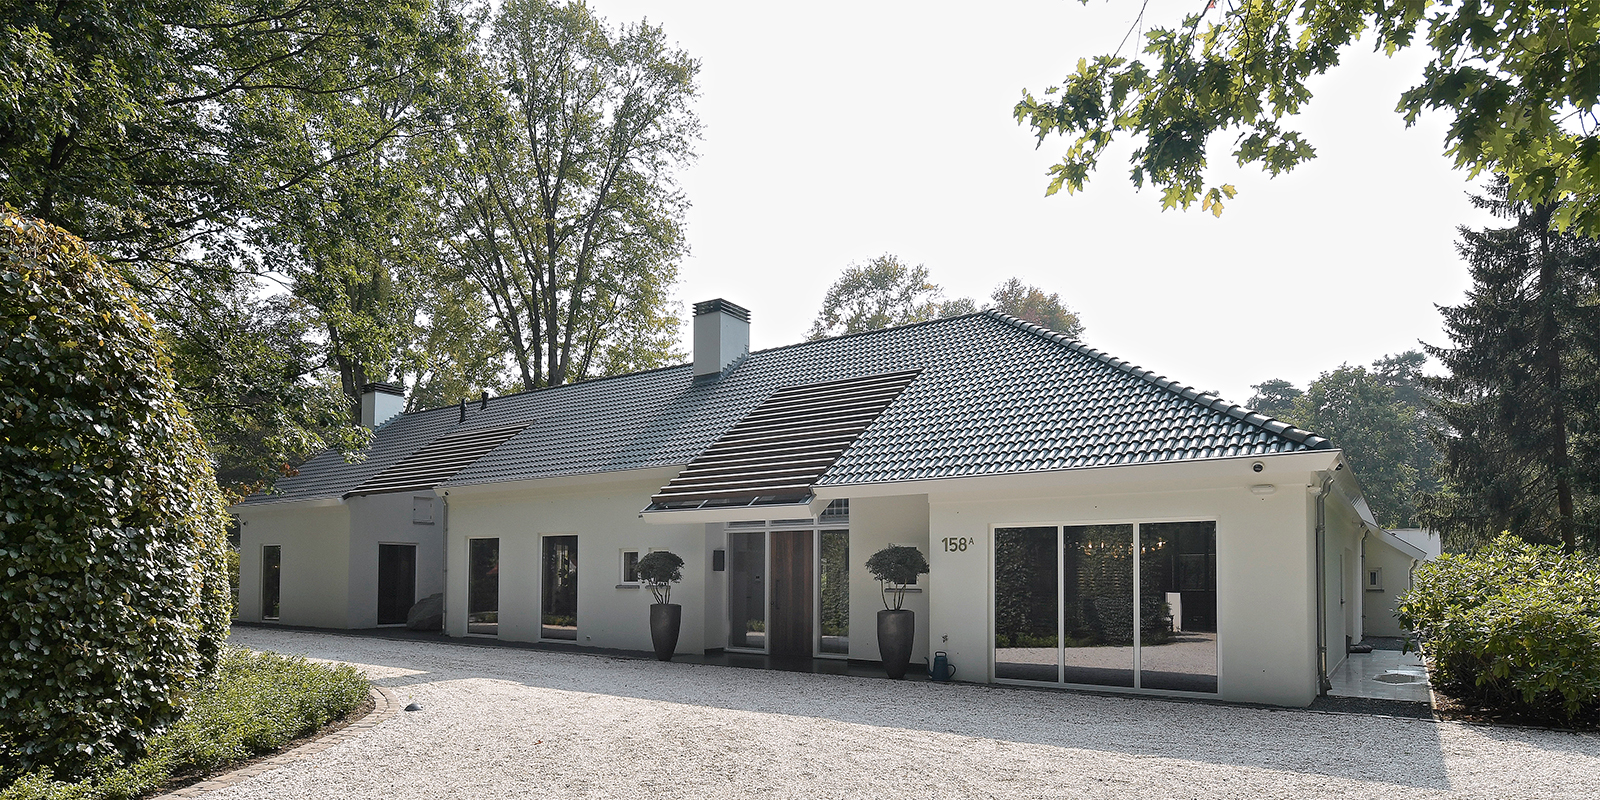 Moderne villa, Drijvers, Interieur, Exterieur, Moderne Architectuur, Villa, Modern interieur,